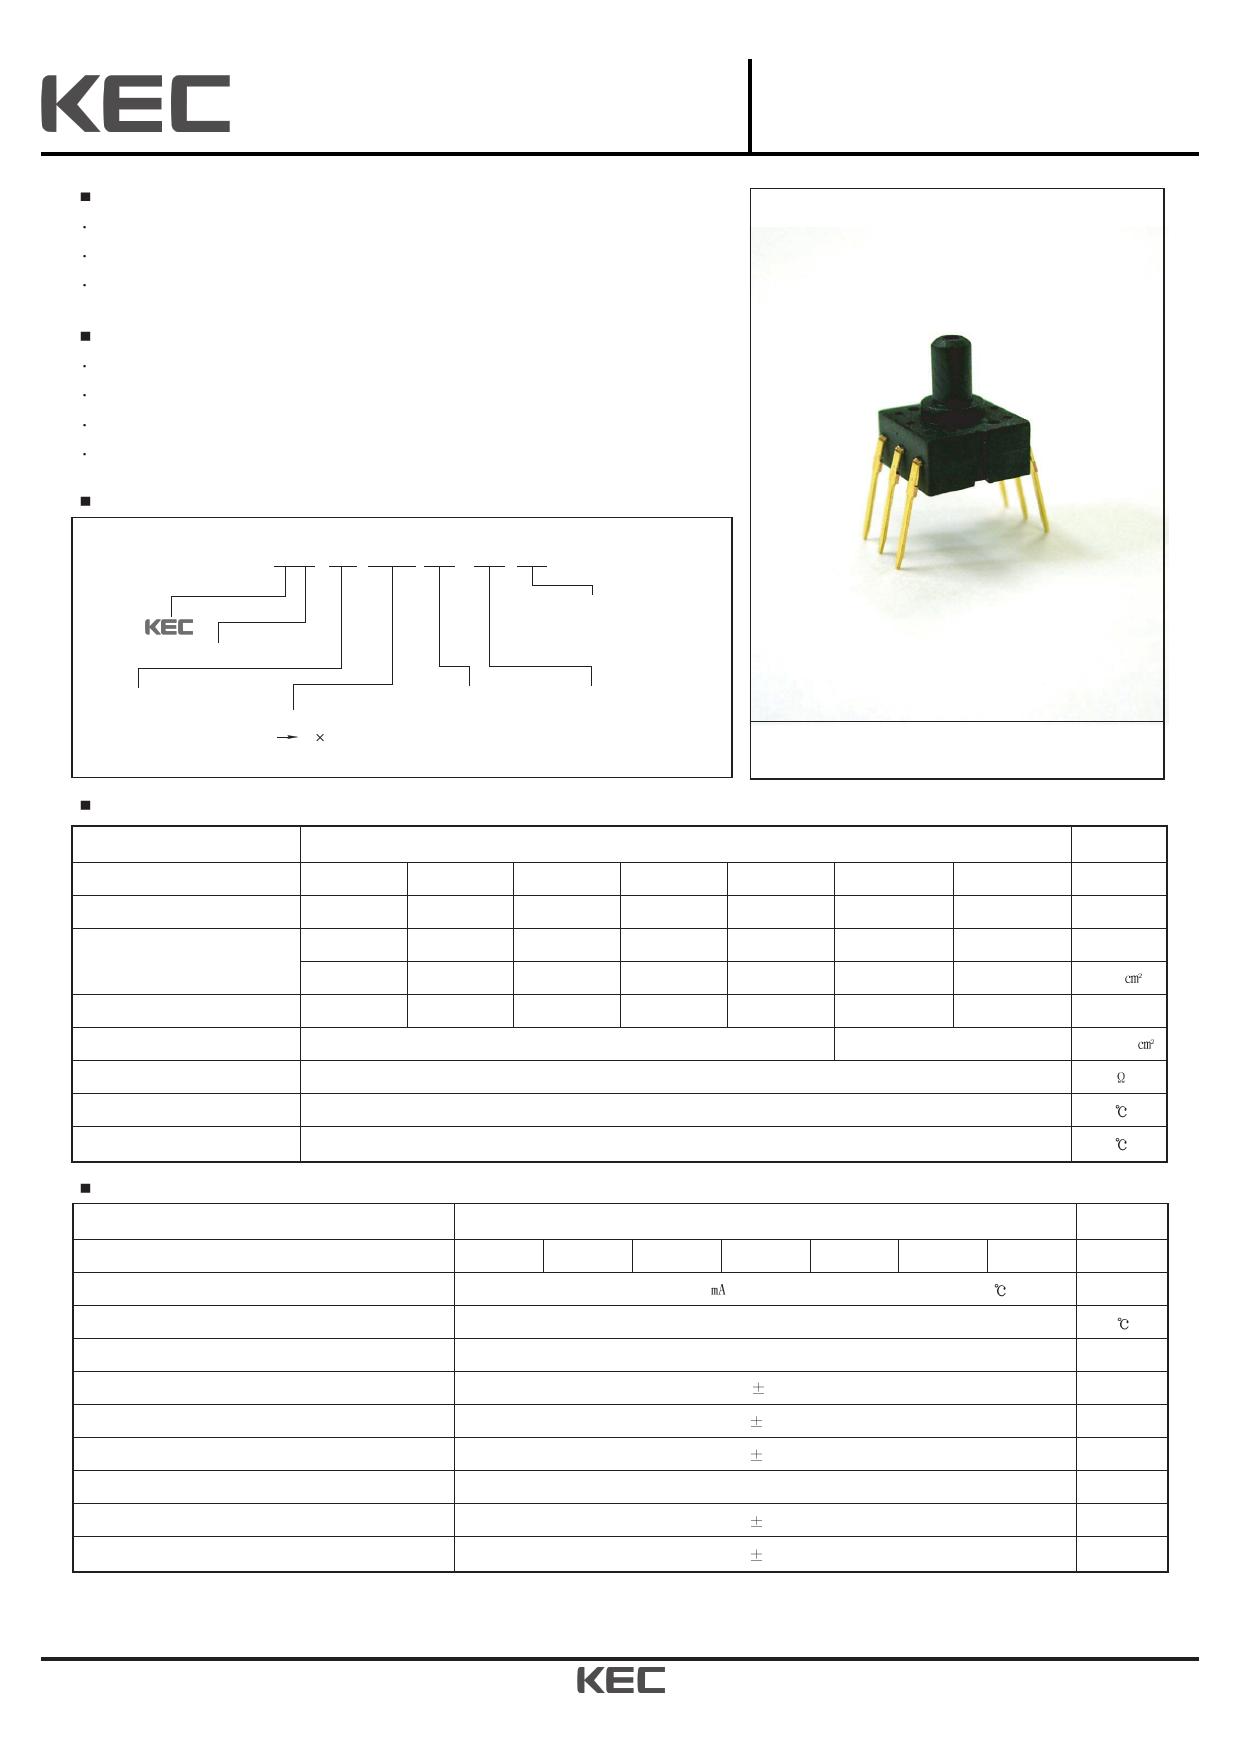 KPF601G01 데이터시트 및 KPF601G01 PDF